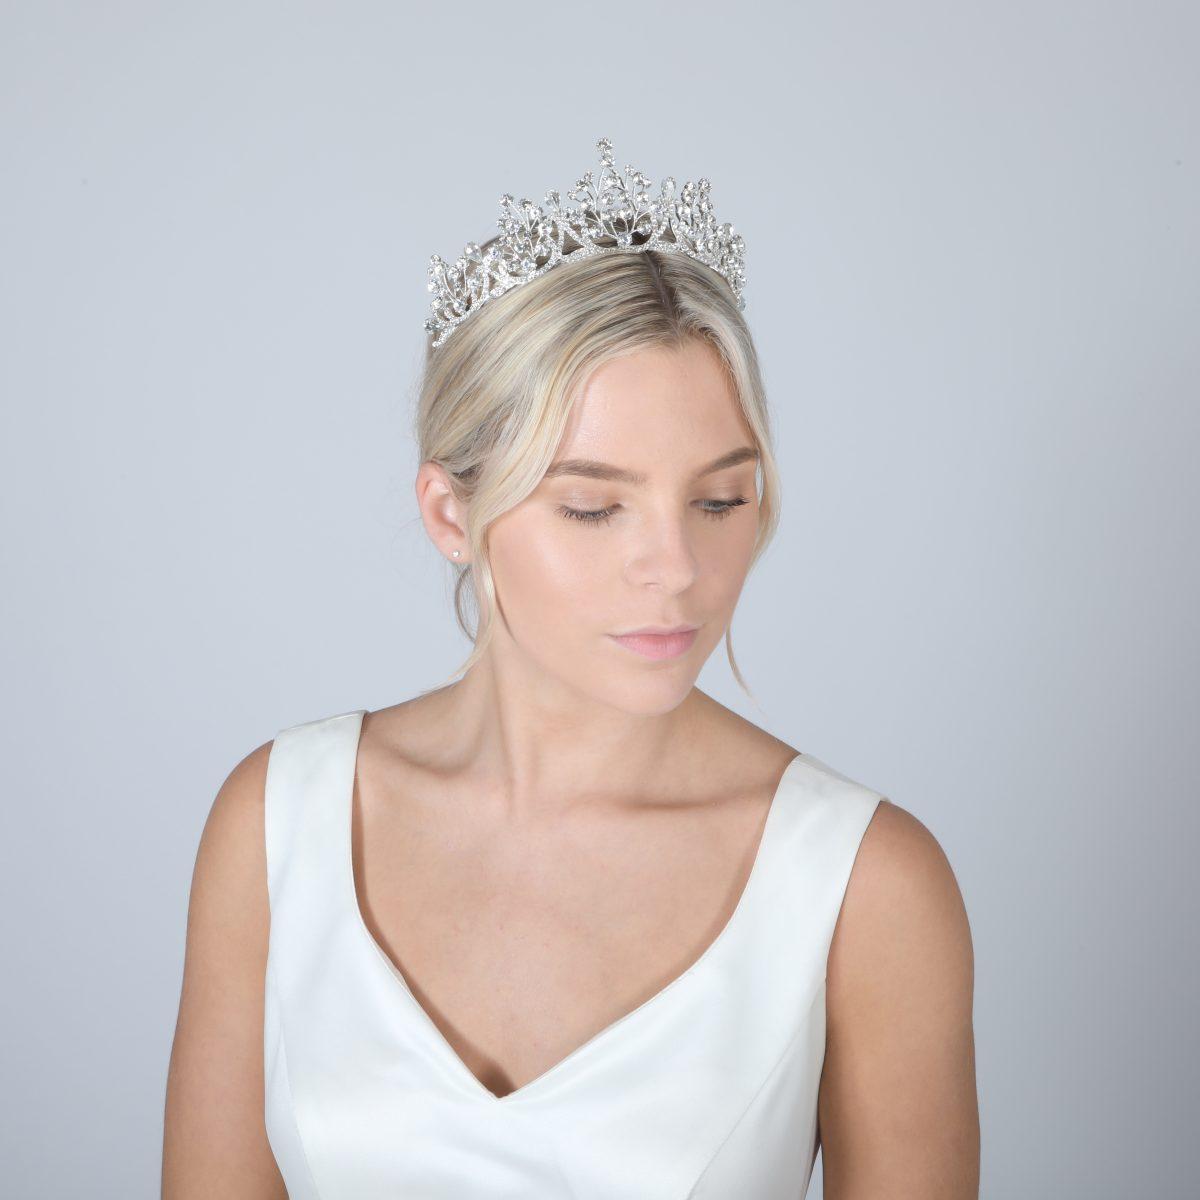 Perfect Bridal Crown - PBT5020 1